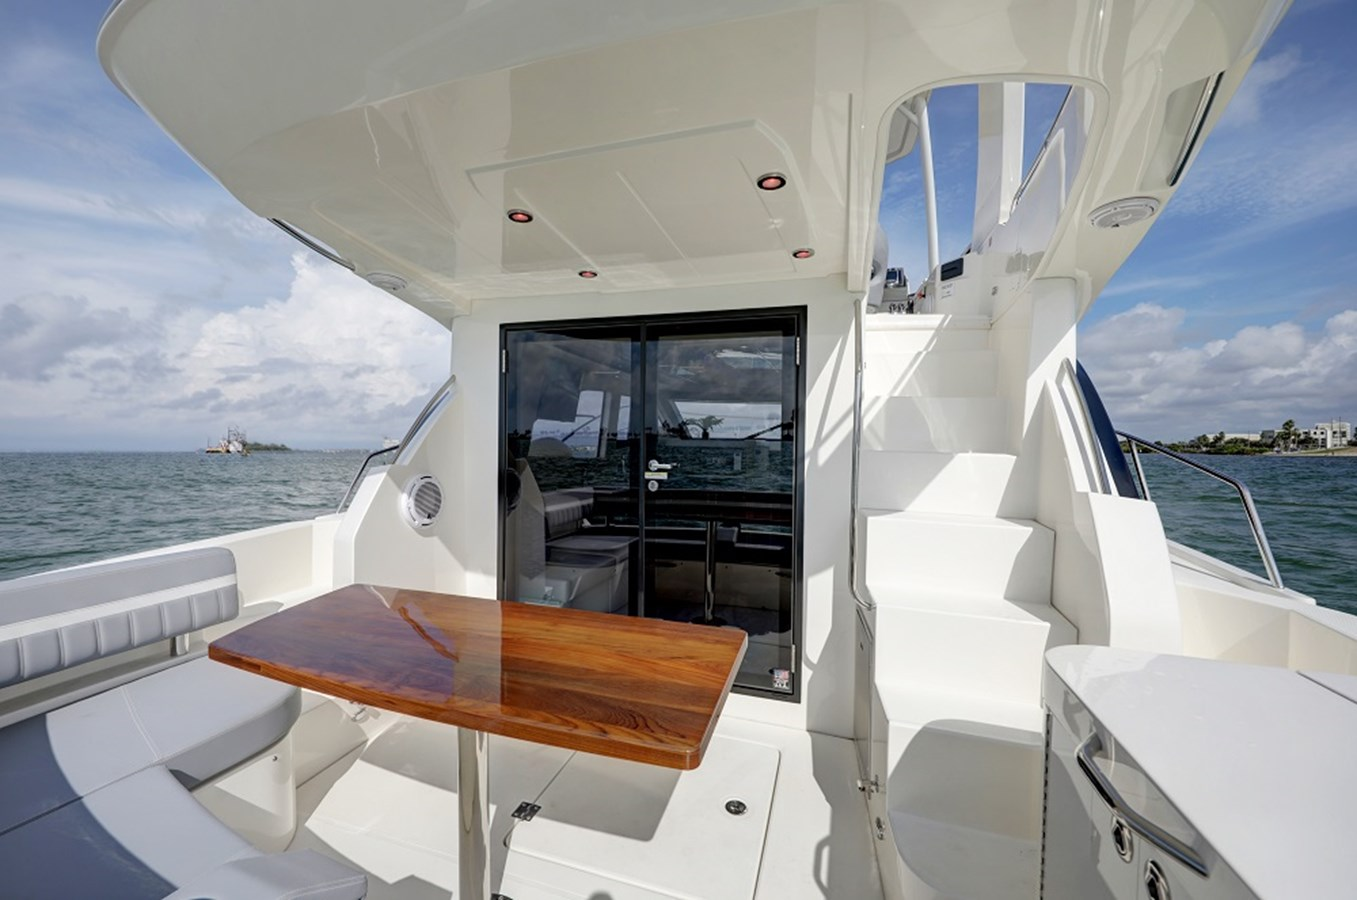 B44A5682_3_4_5_6 2020 CARVER C40 Command Bridge Motor Yacht 2825081